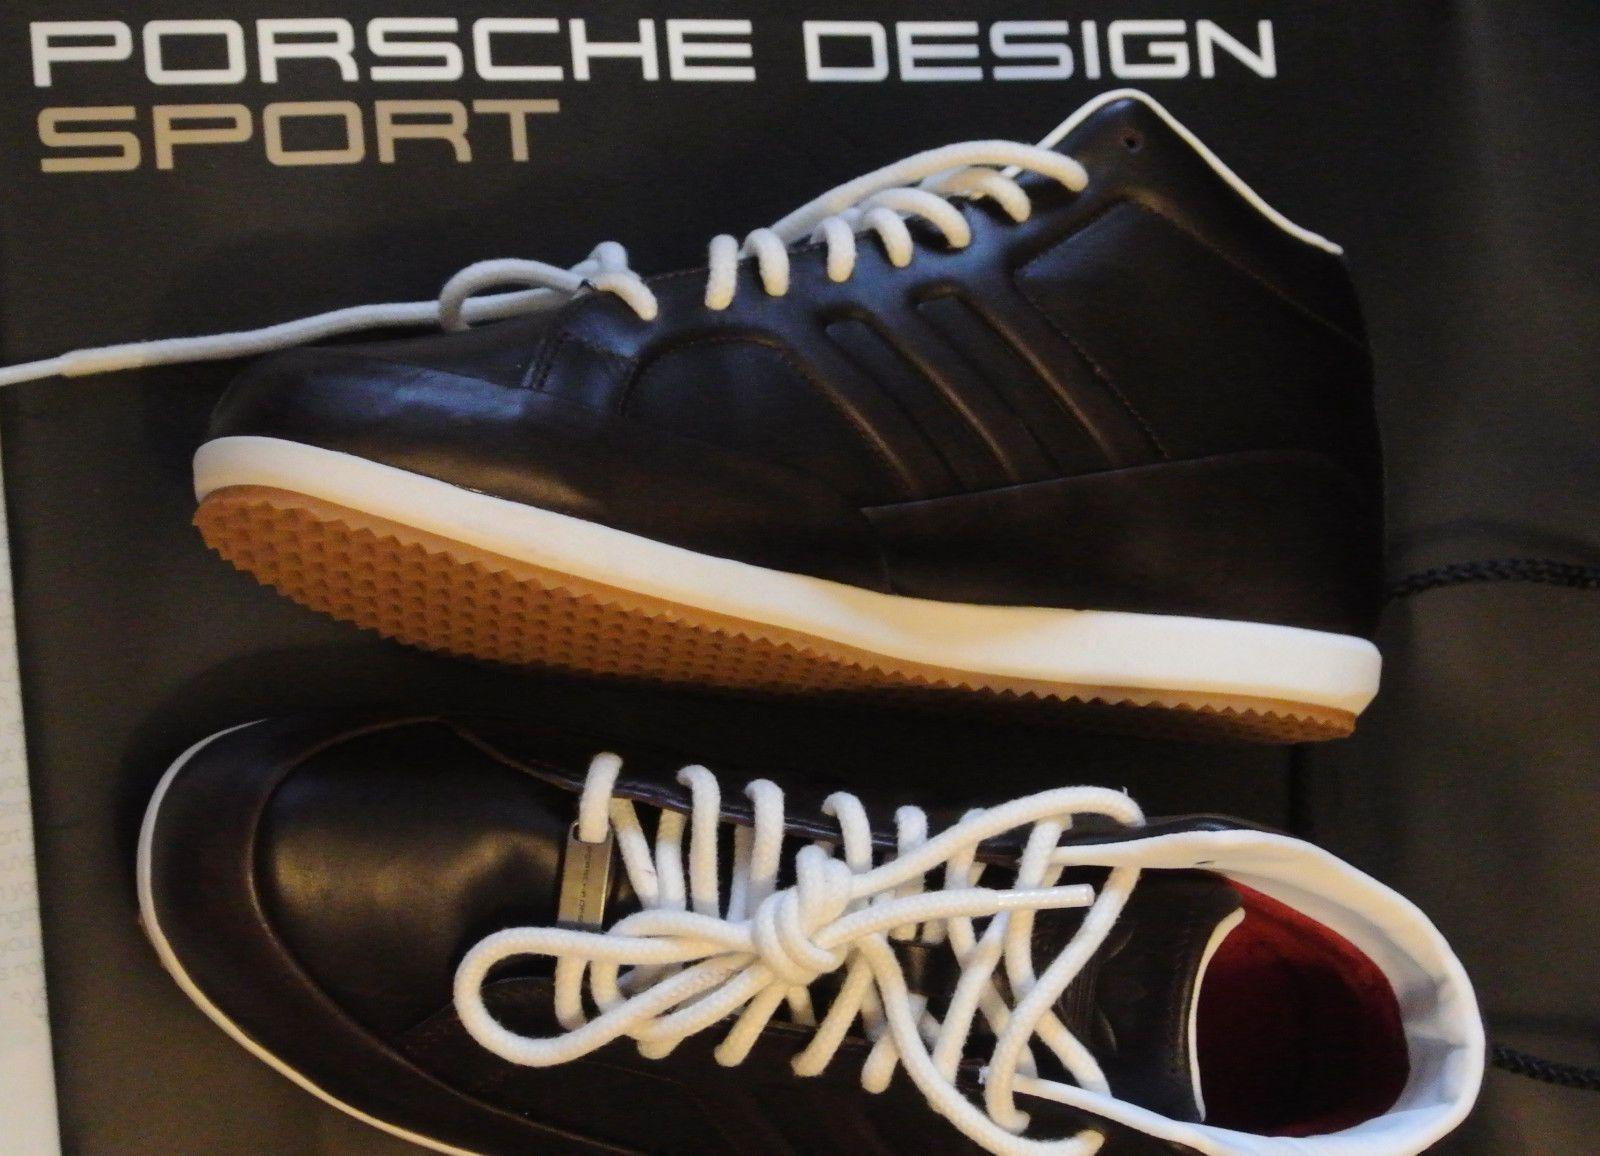 best service 33d30 77ab1 ... New Sneakers Adidas Porsche Design 356 Mid 1.2 S81531 Size 11.5  Training shoes ...